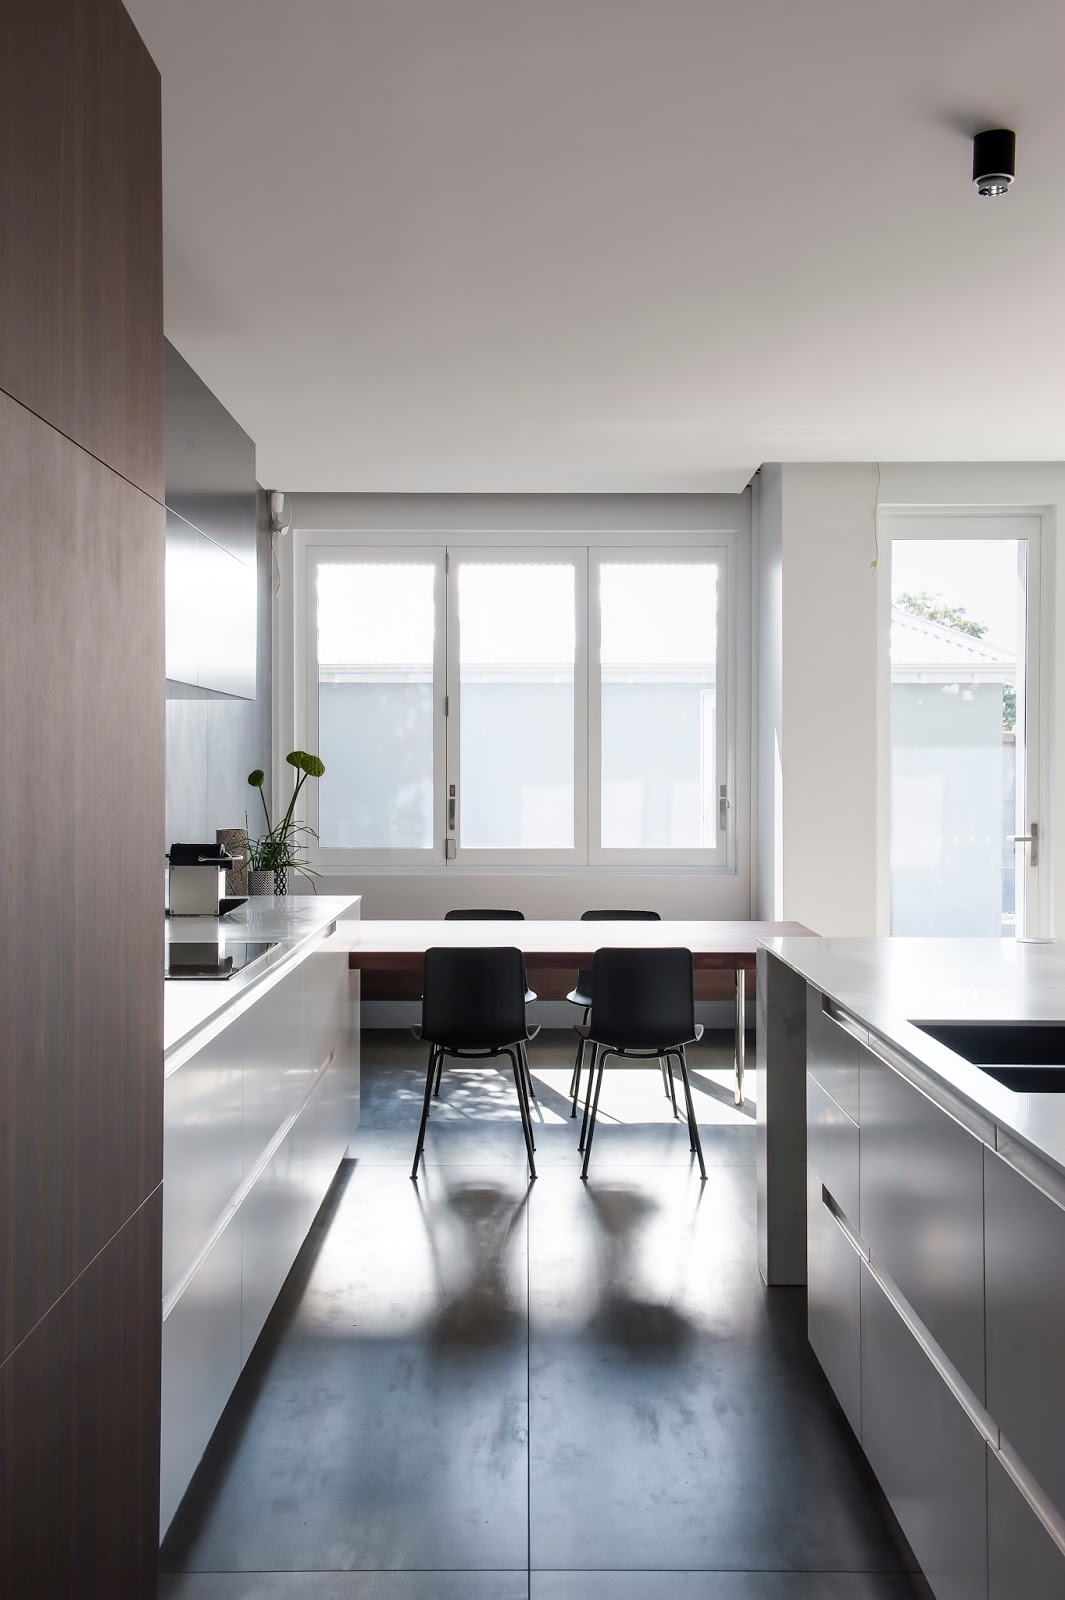 Contemporary Kitchen Asia Mold - Kitchen Cabinets | Ideas ...